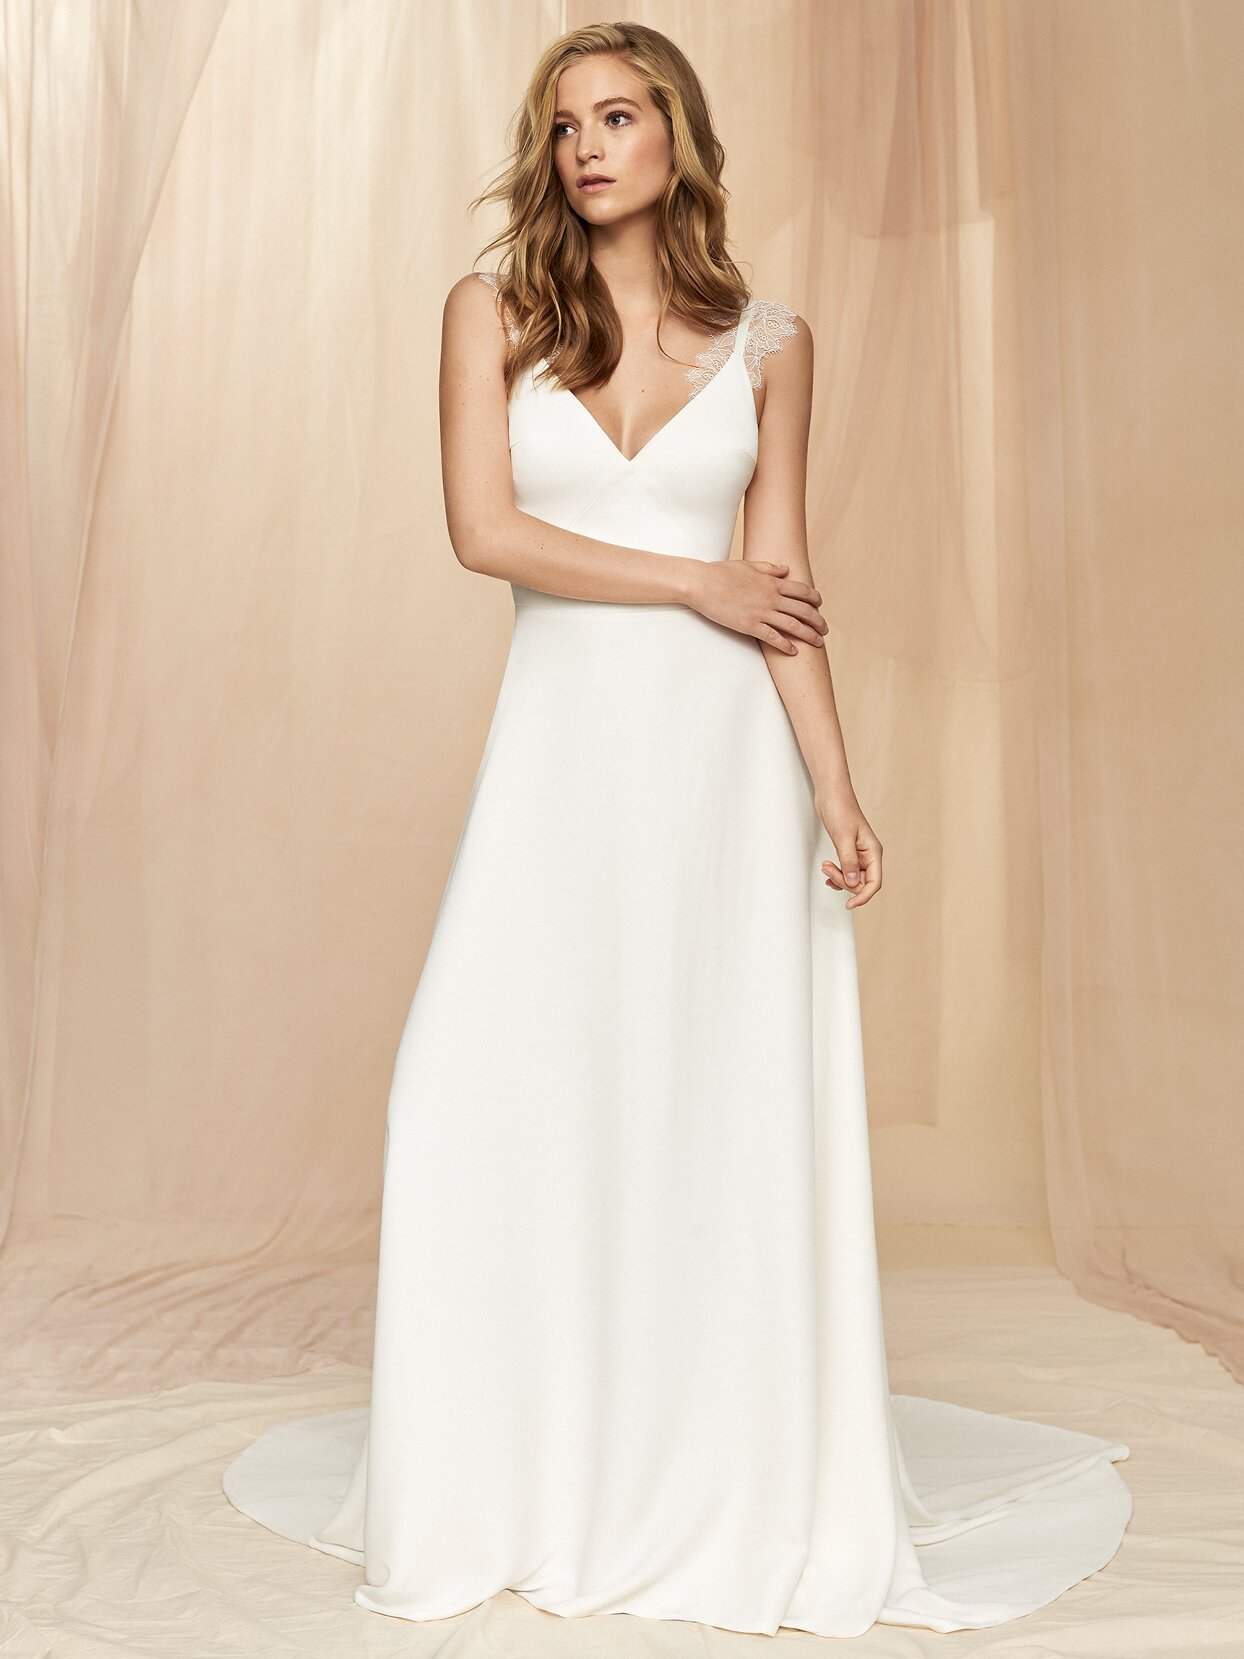 Savannah Miller Fall 2020 Wedding Dress Collection Martha